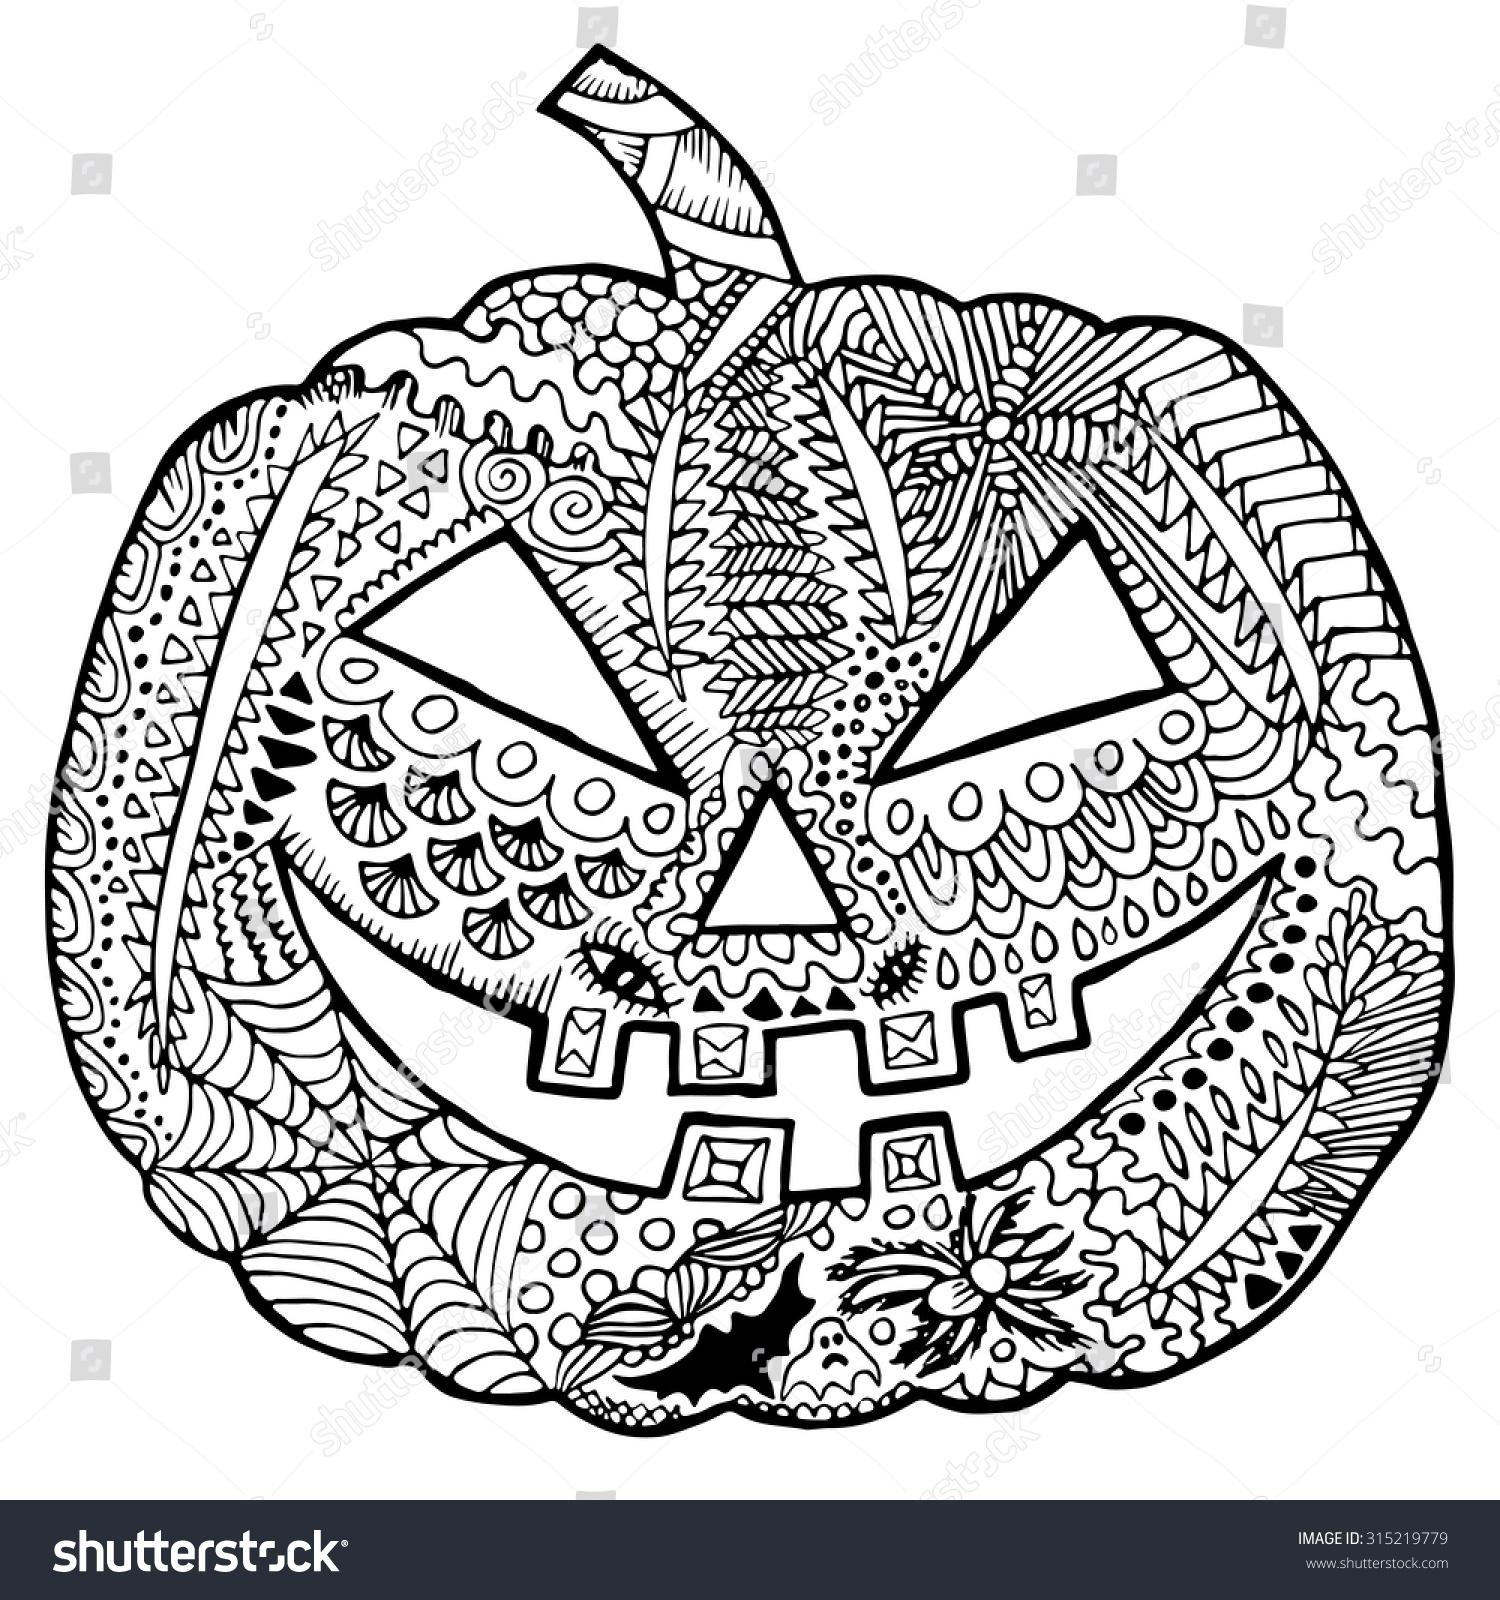 Zentangle Pumpkin Halloween Zentangle Illustration Autumn Stock Vector Royalty Free 315219779